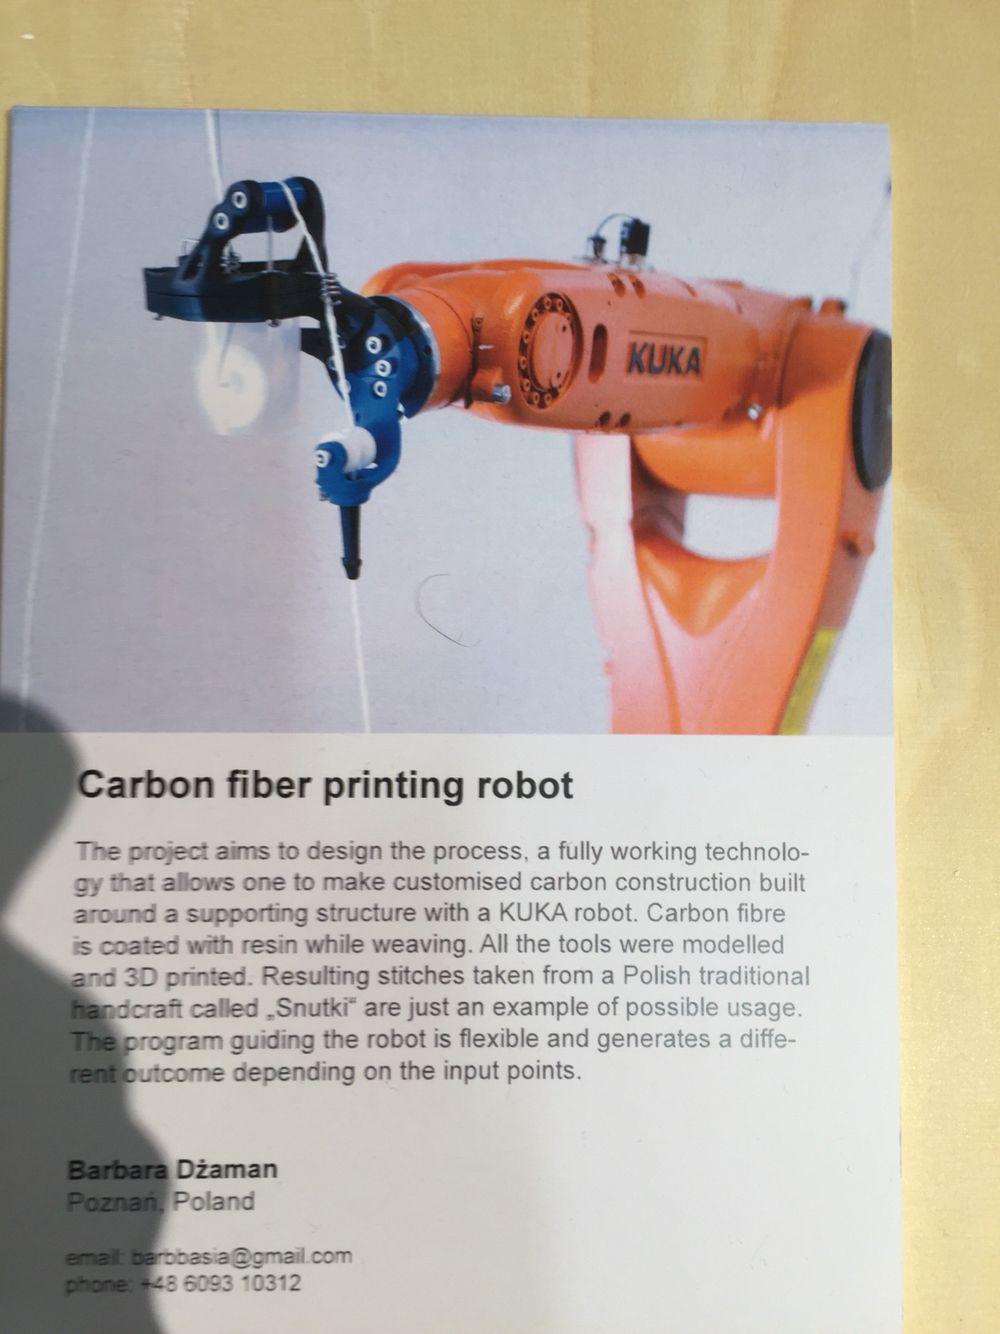 3D printed Carbon fibre Carbon fiber, Prints, Carbon